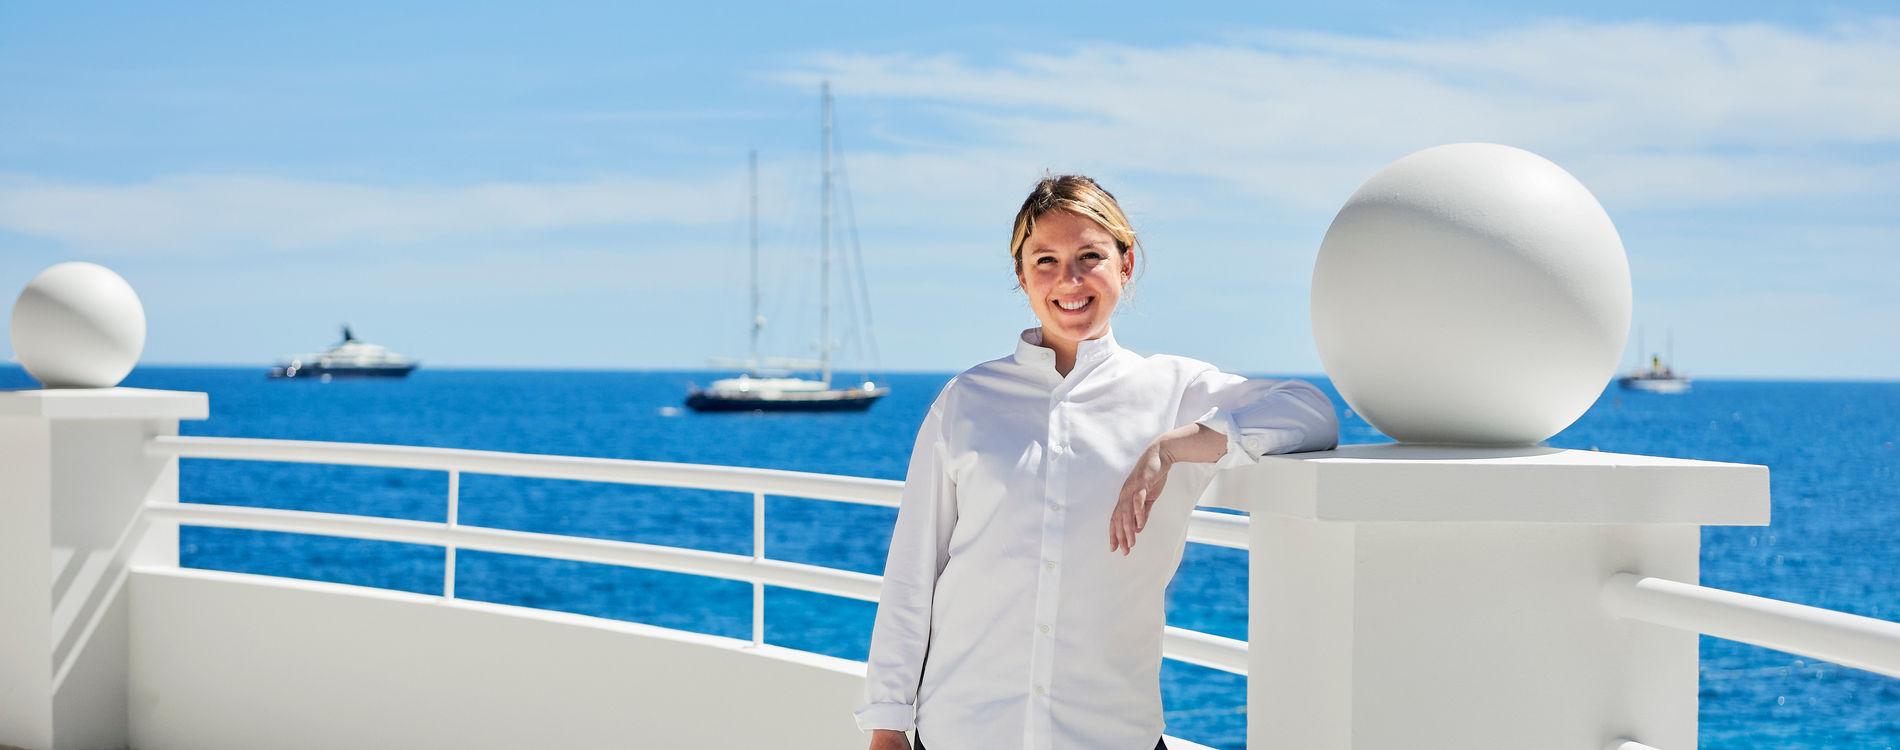 Monte-Carlo Beach Restaurant Elsa - Manon Fleury